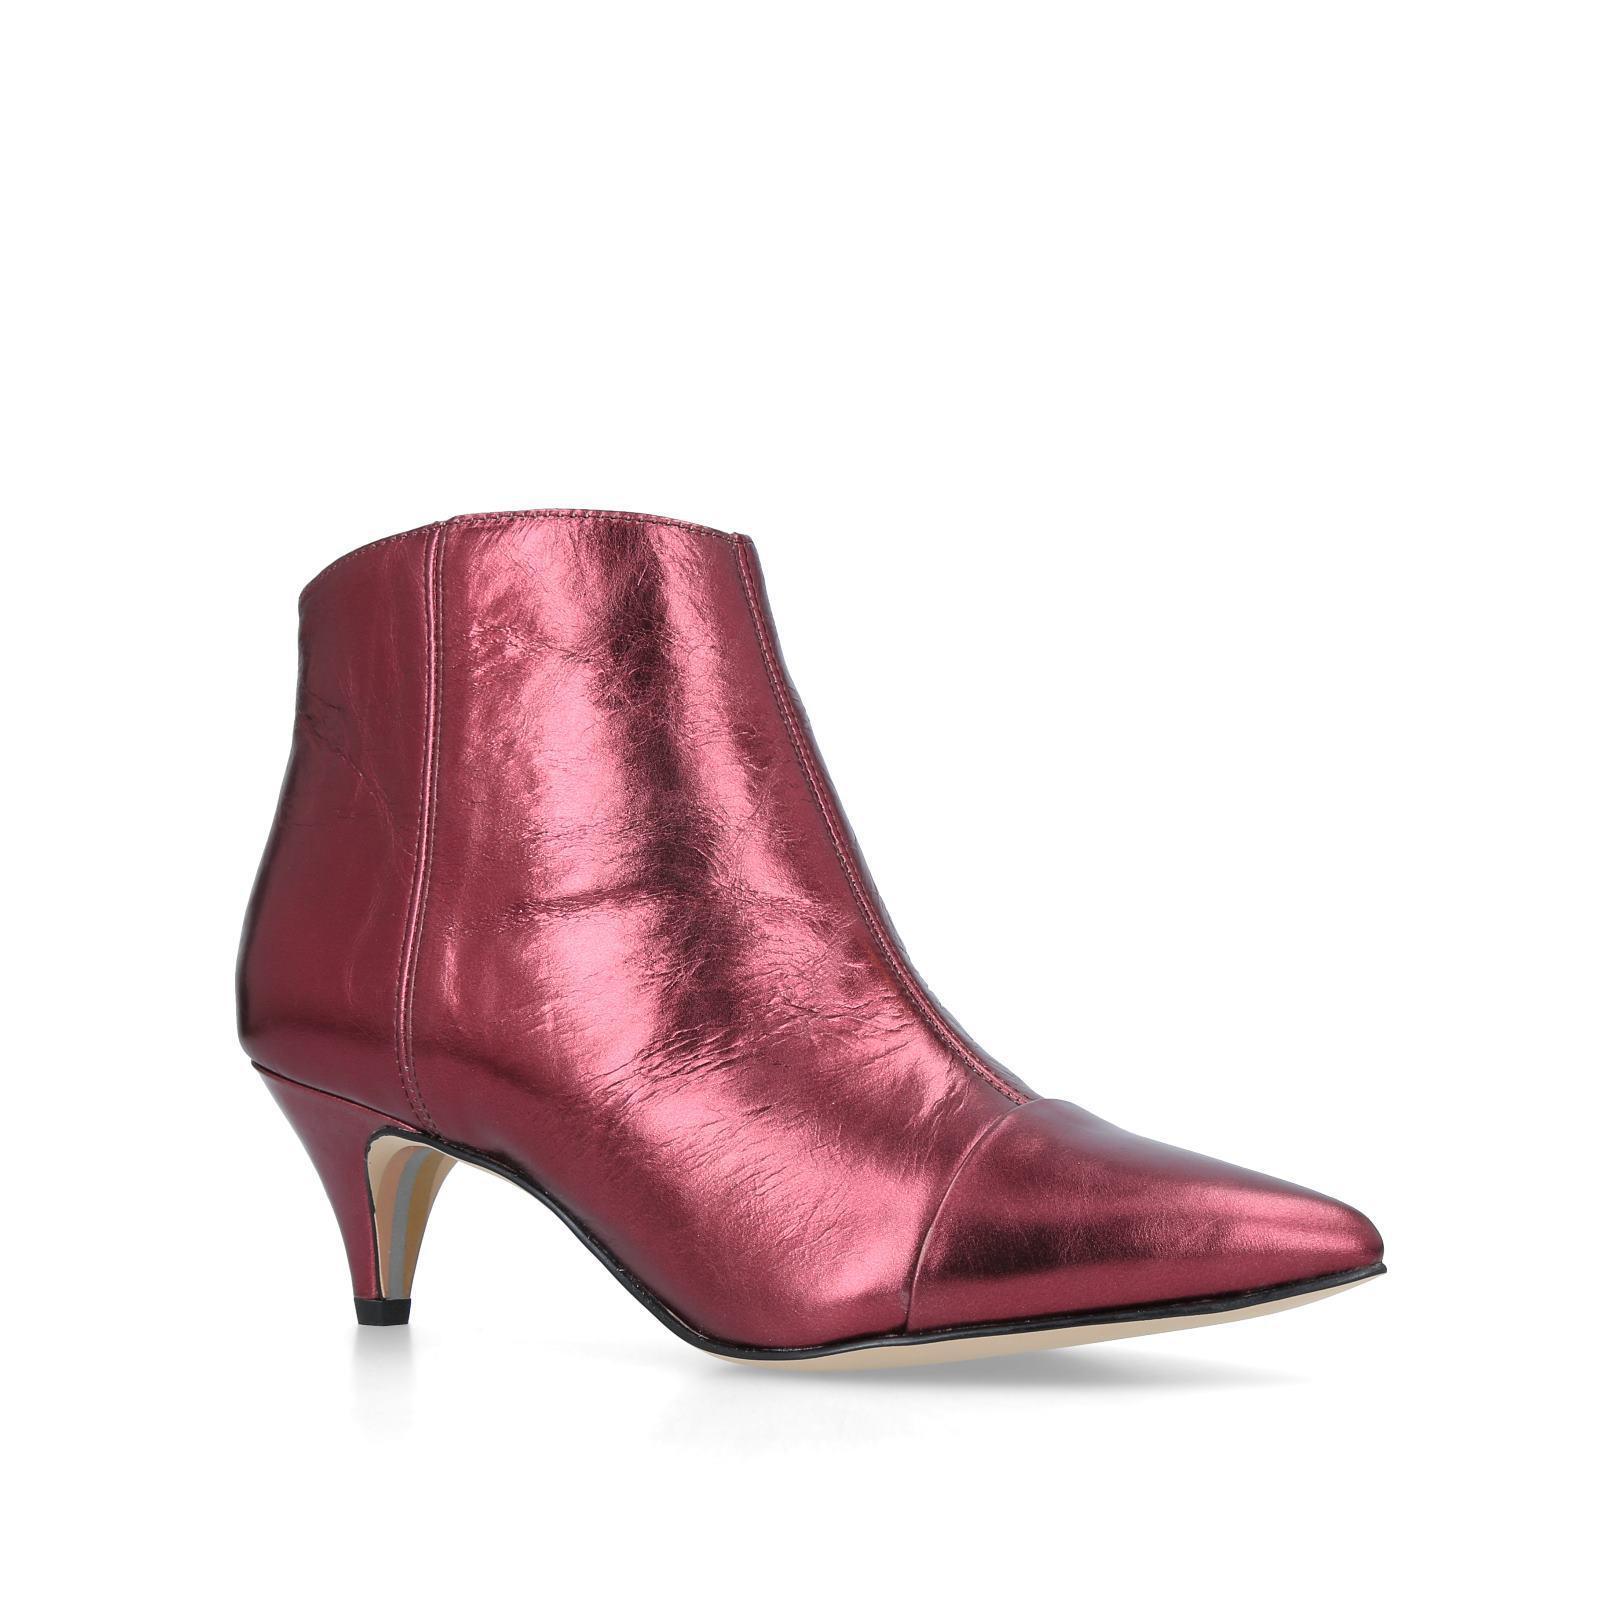 c2927cd335dc4f Sam Edelman Kinzey Boot in Red - Lyst